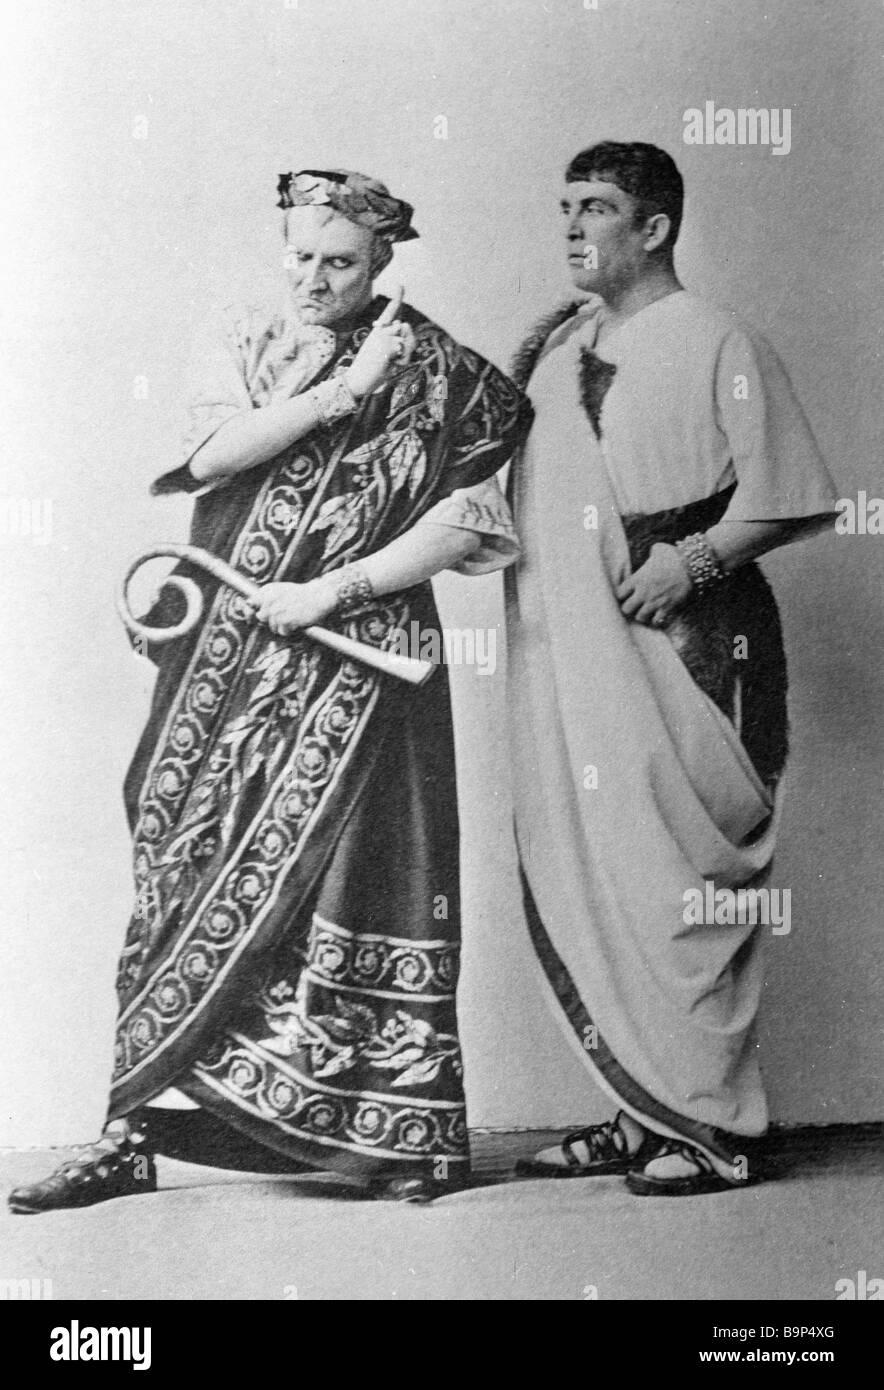 Actor Vasily Kachalov left as Julius Caesar and actor Alexander Vishnevsky right as Mark Antony in Julius Caesar - Stock Image